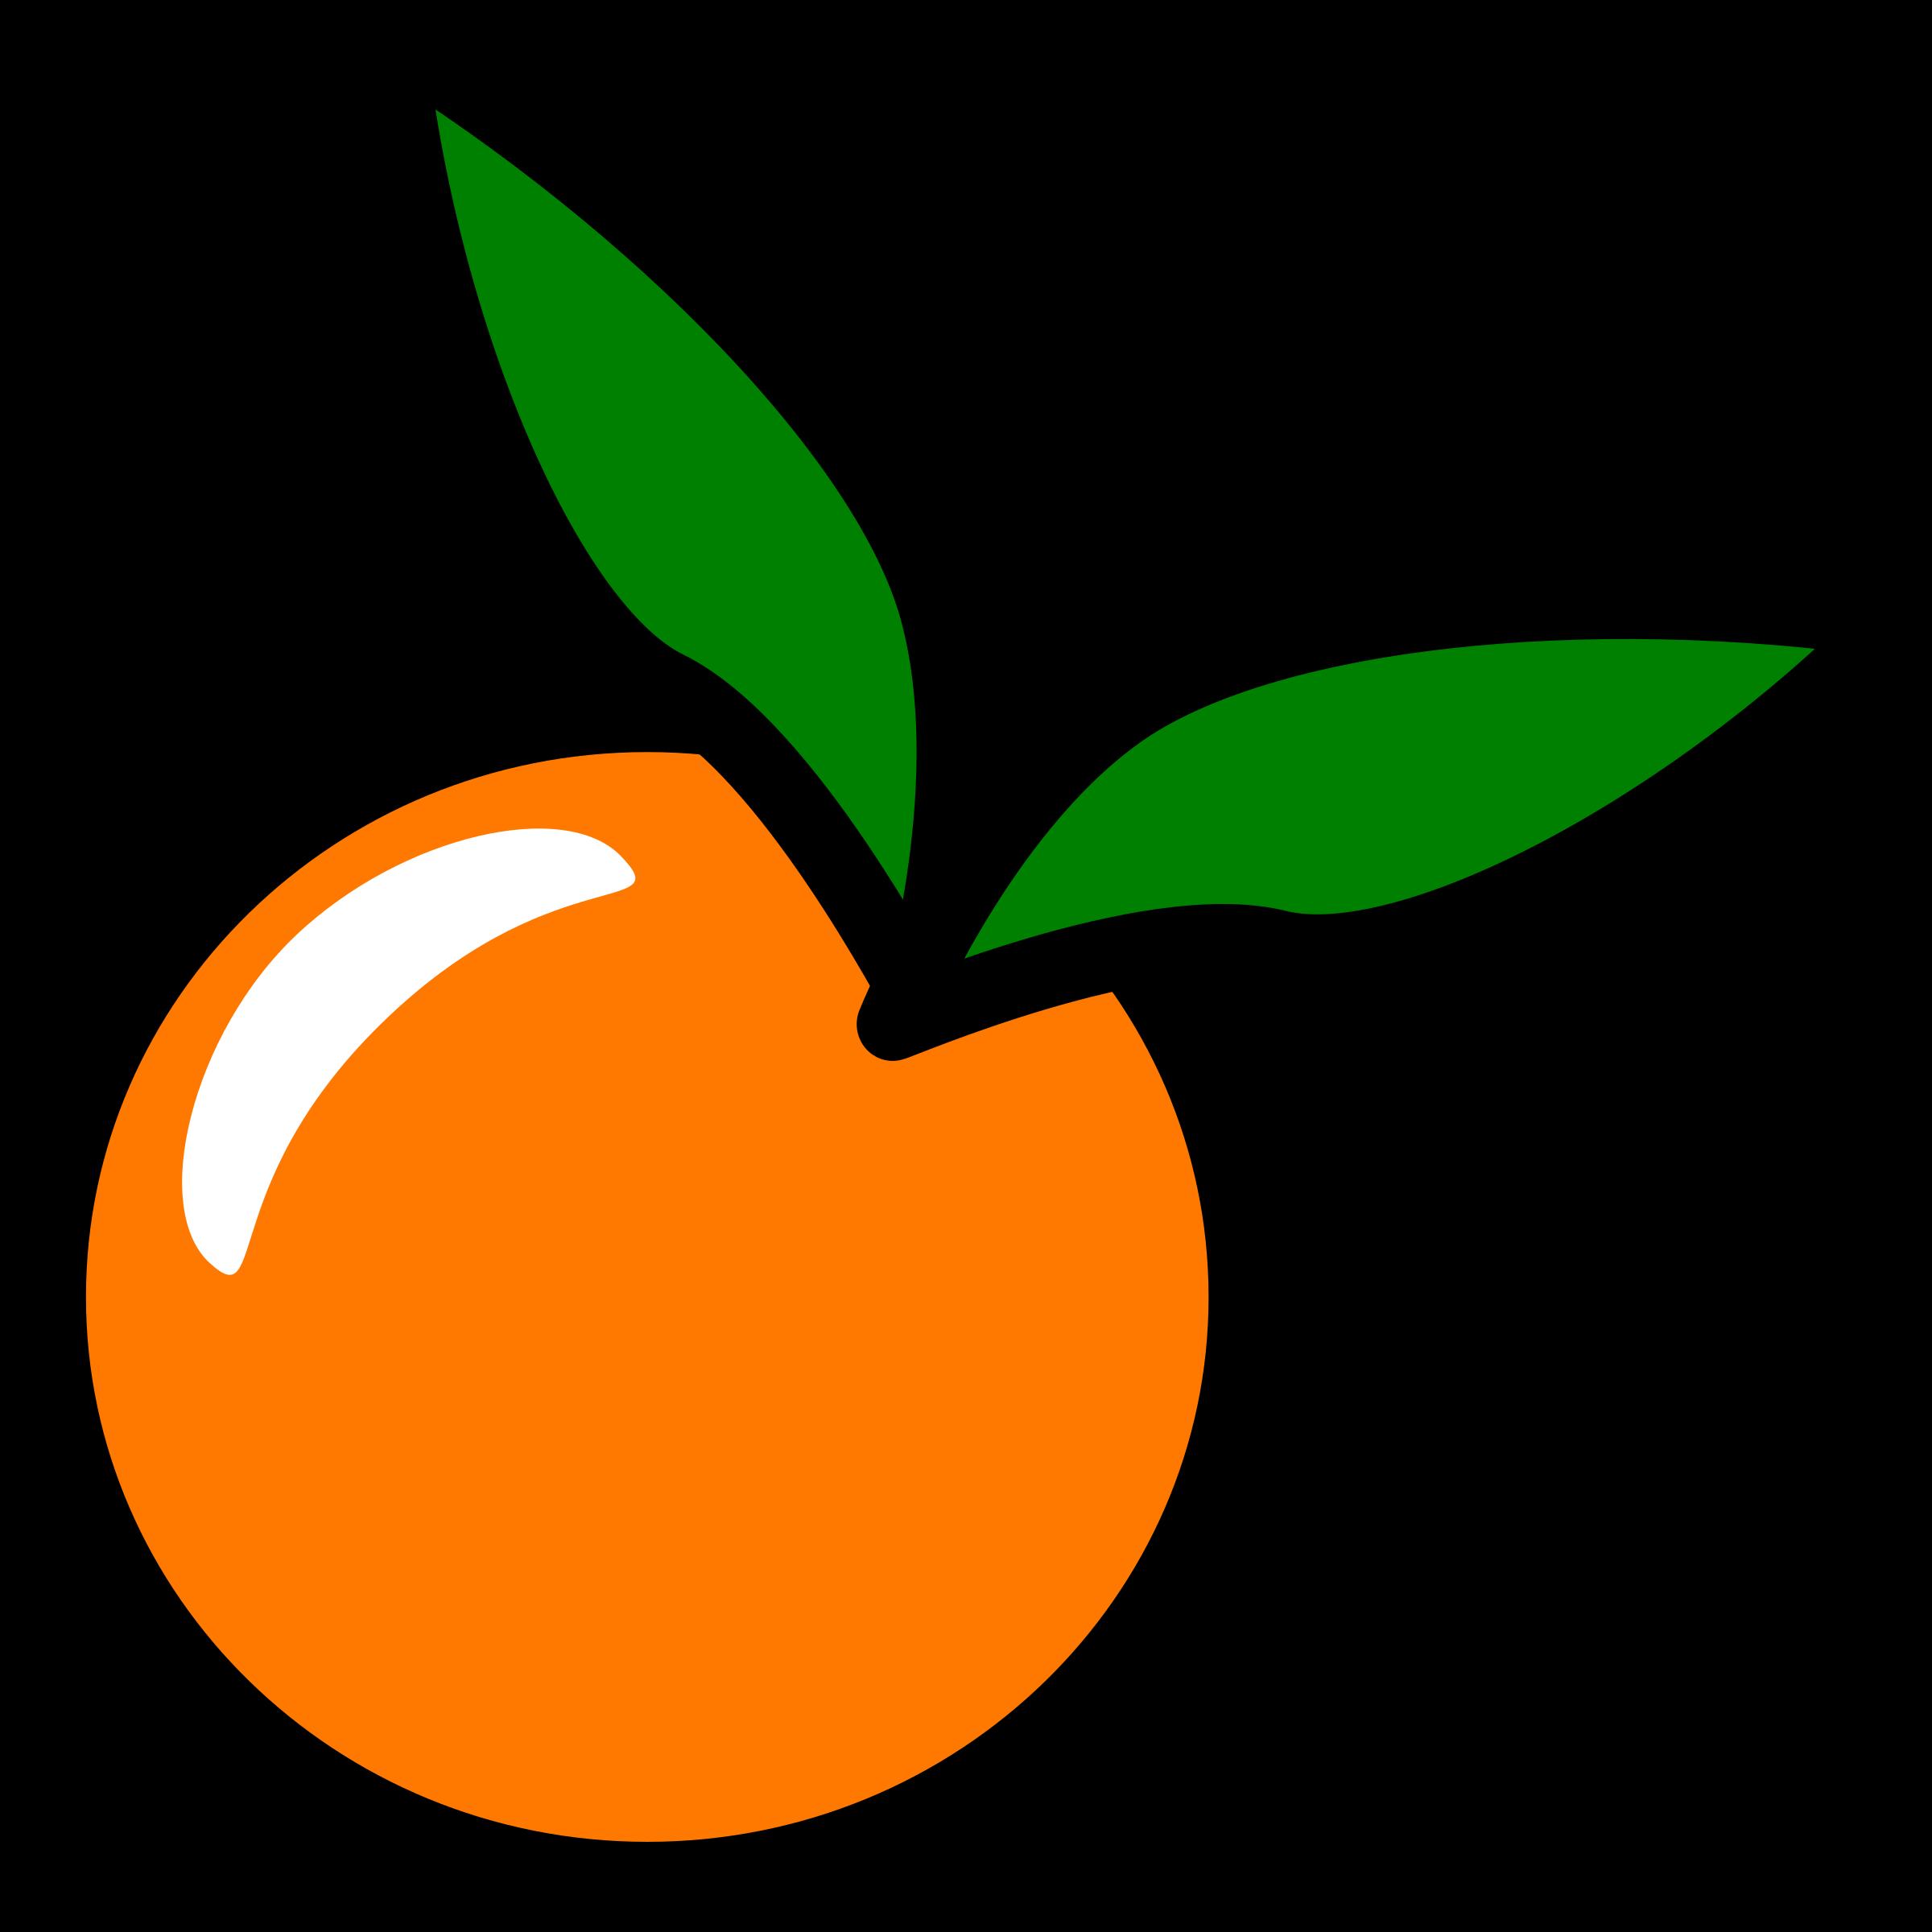 Orange icon big image. Foods clipart minimalist